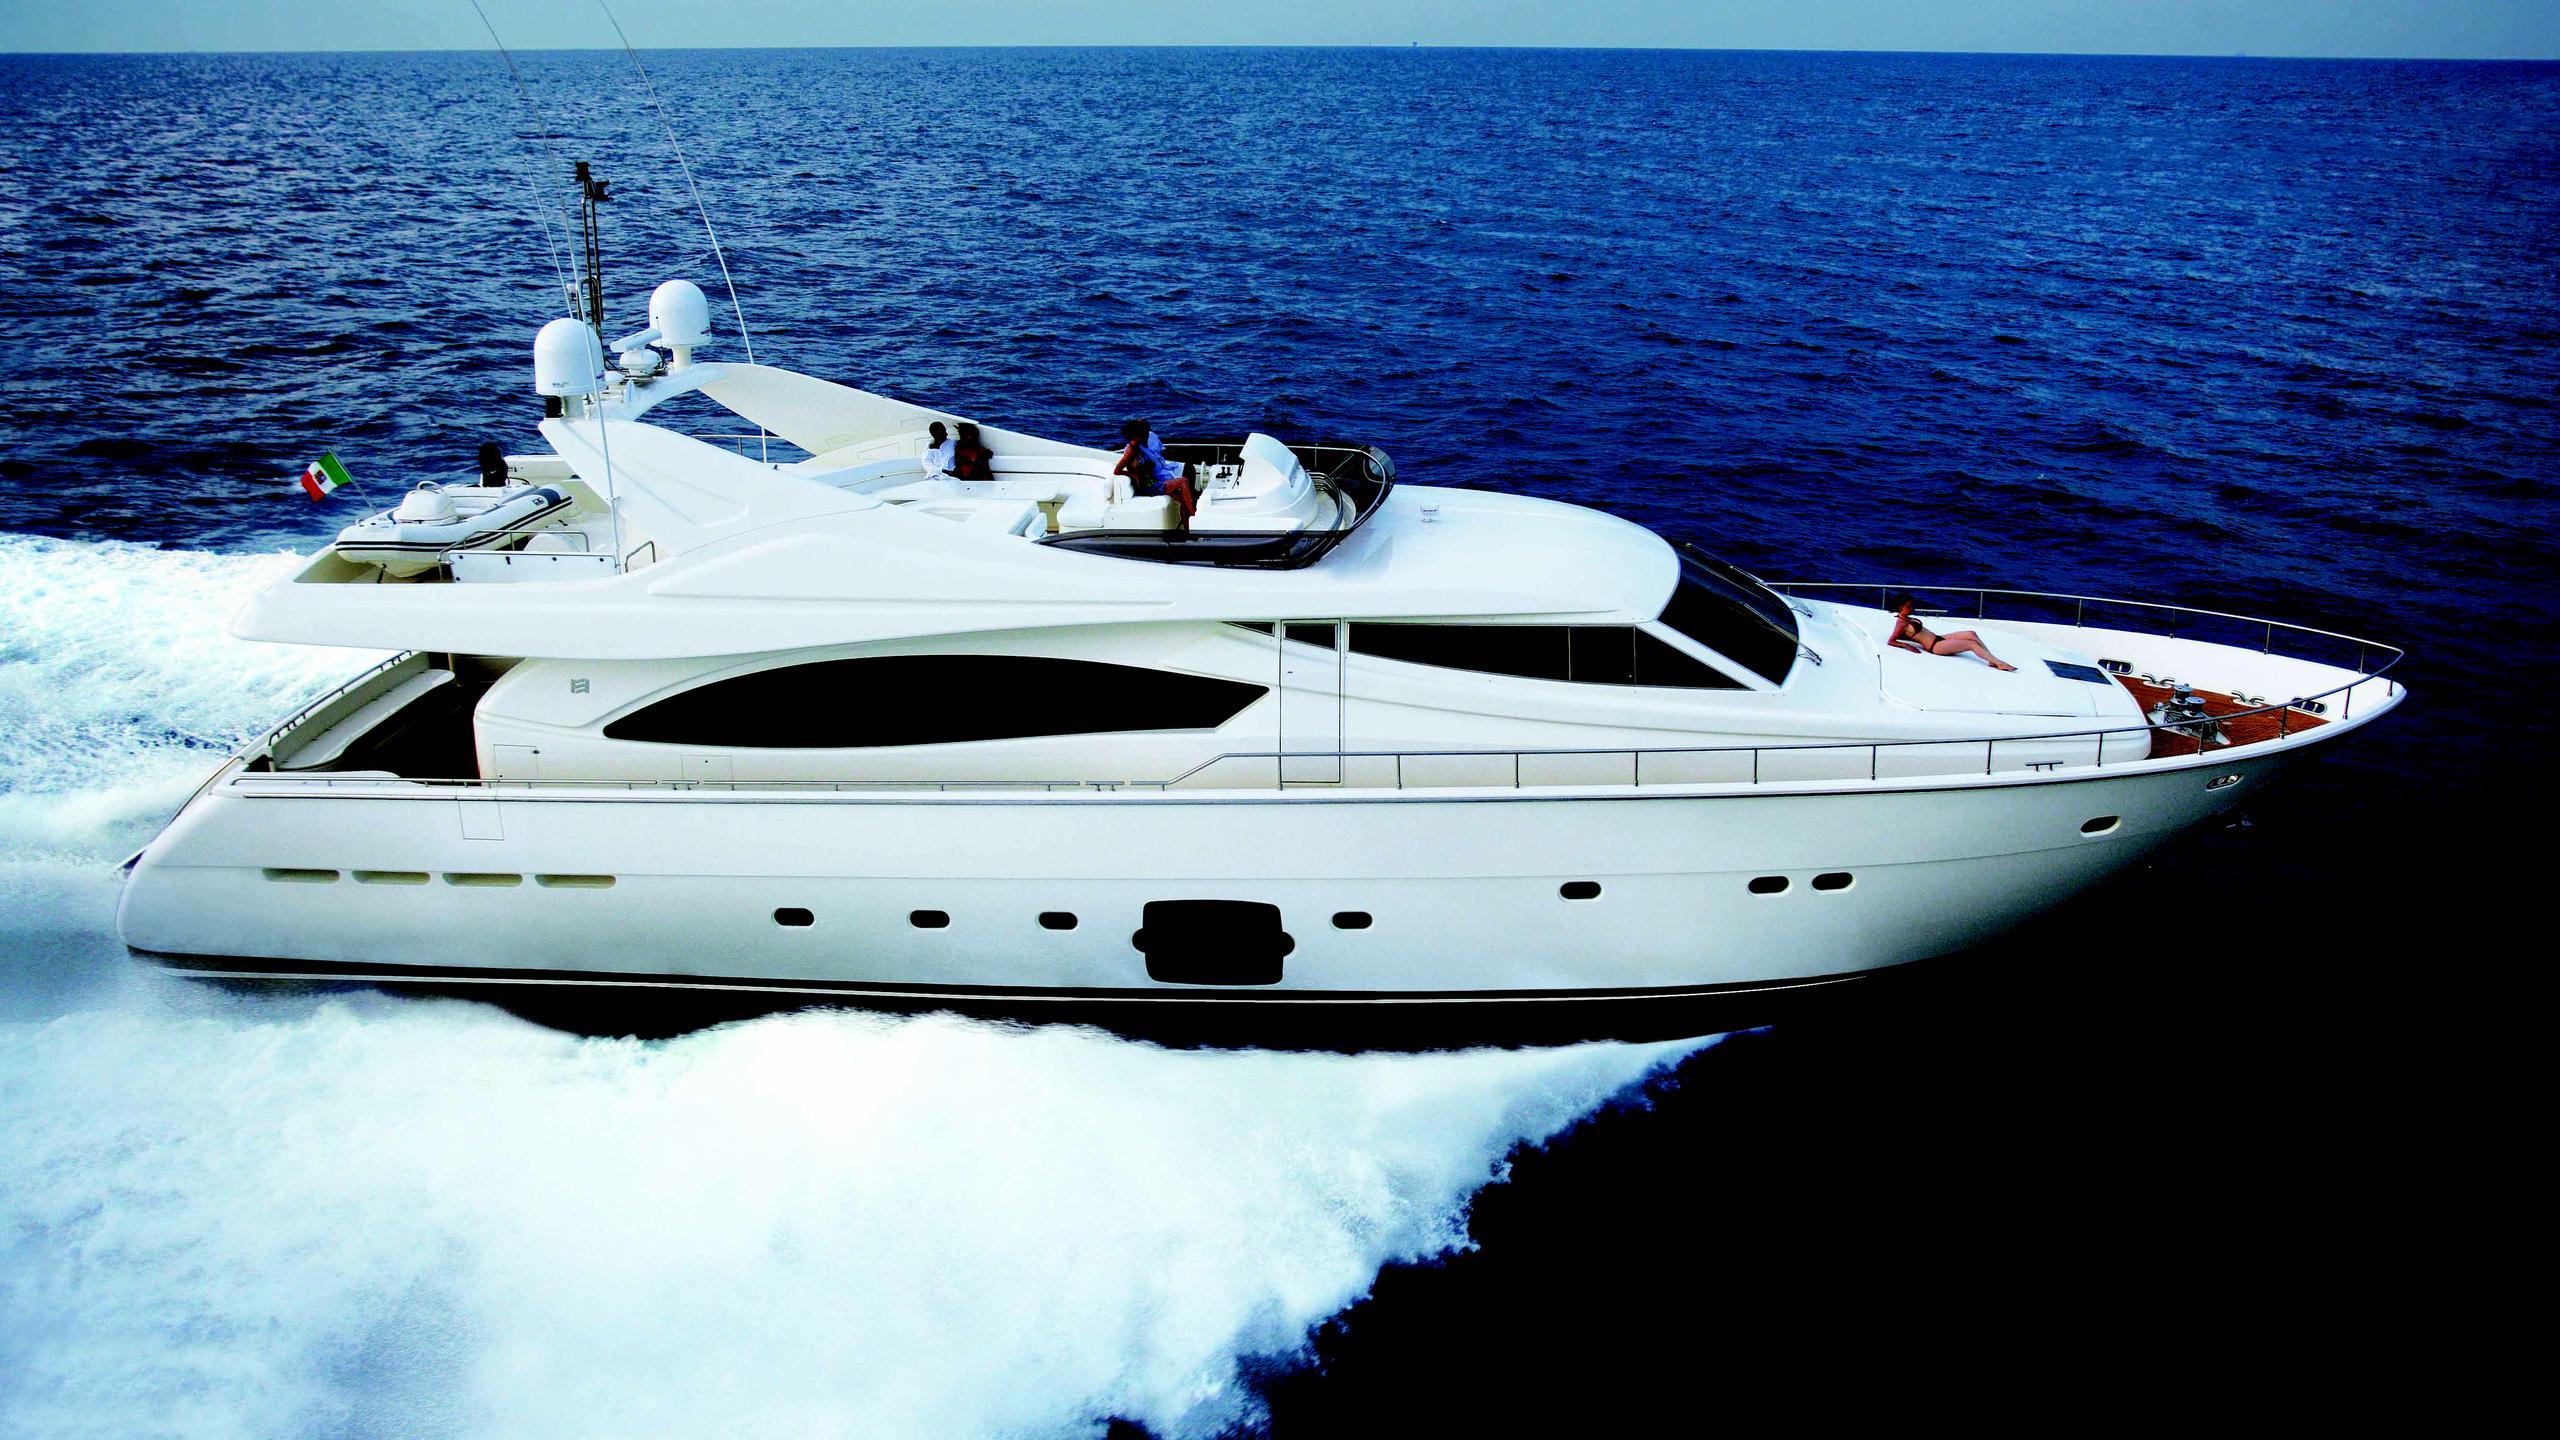 dewa-racci-motor-yacht-ferretti-880-2004-27m-cruising